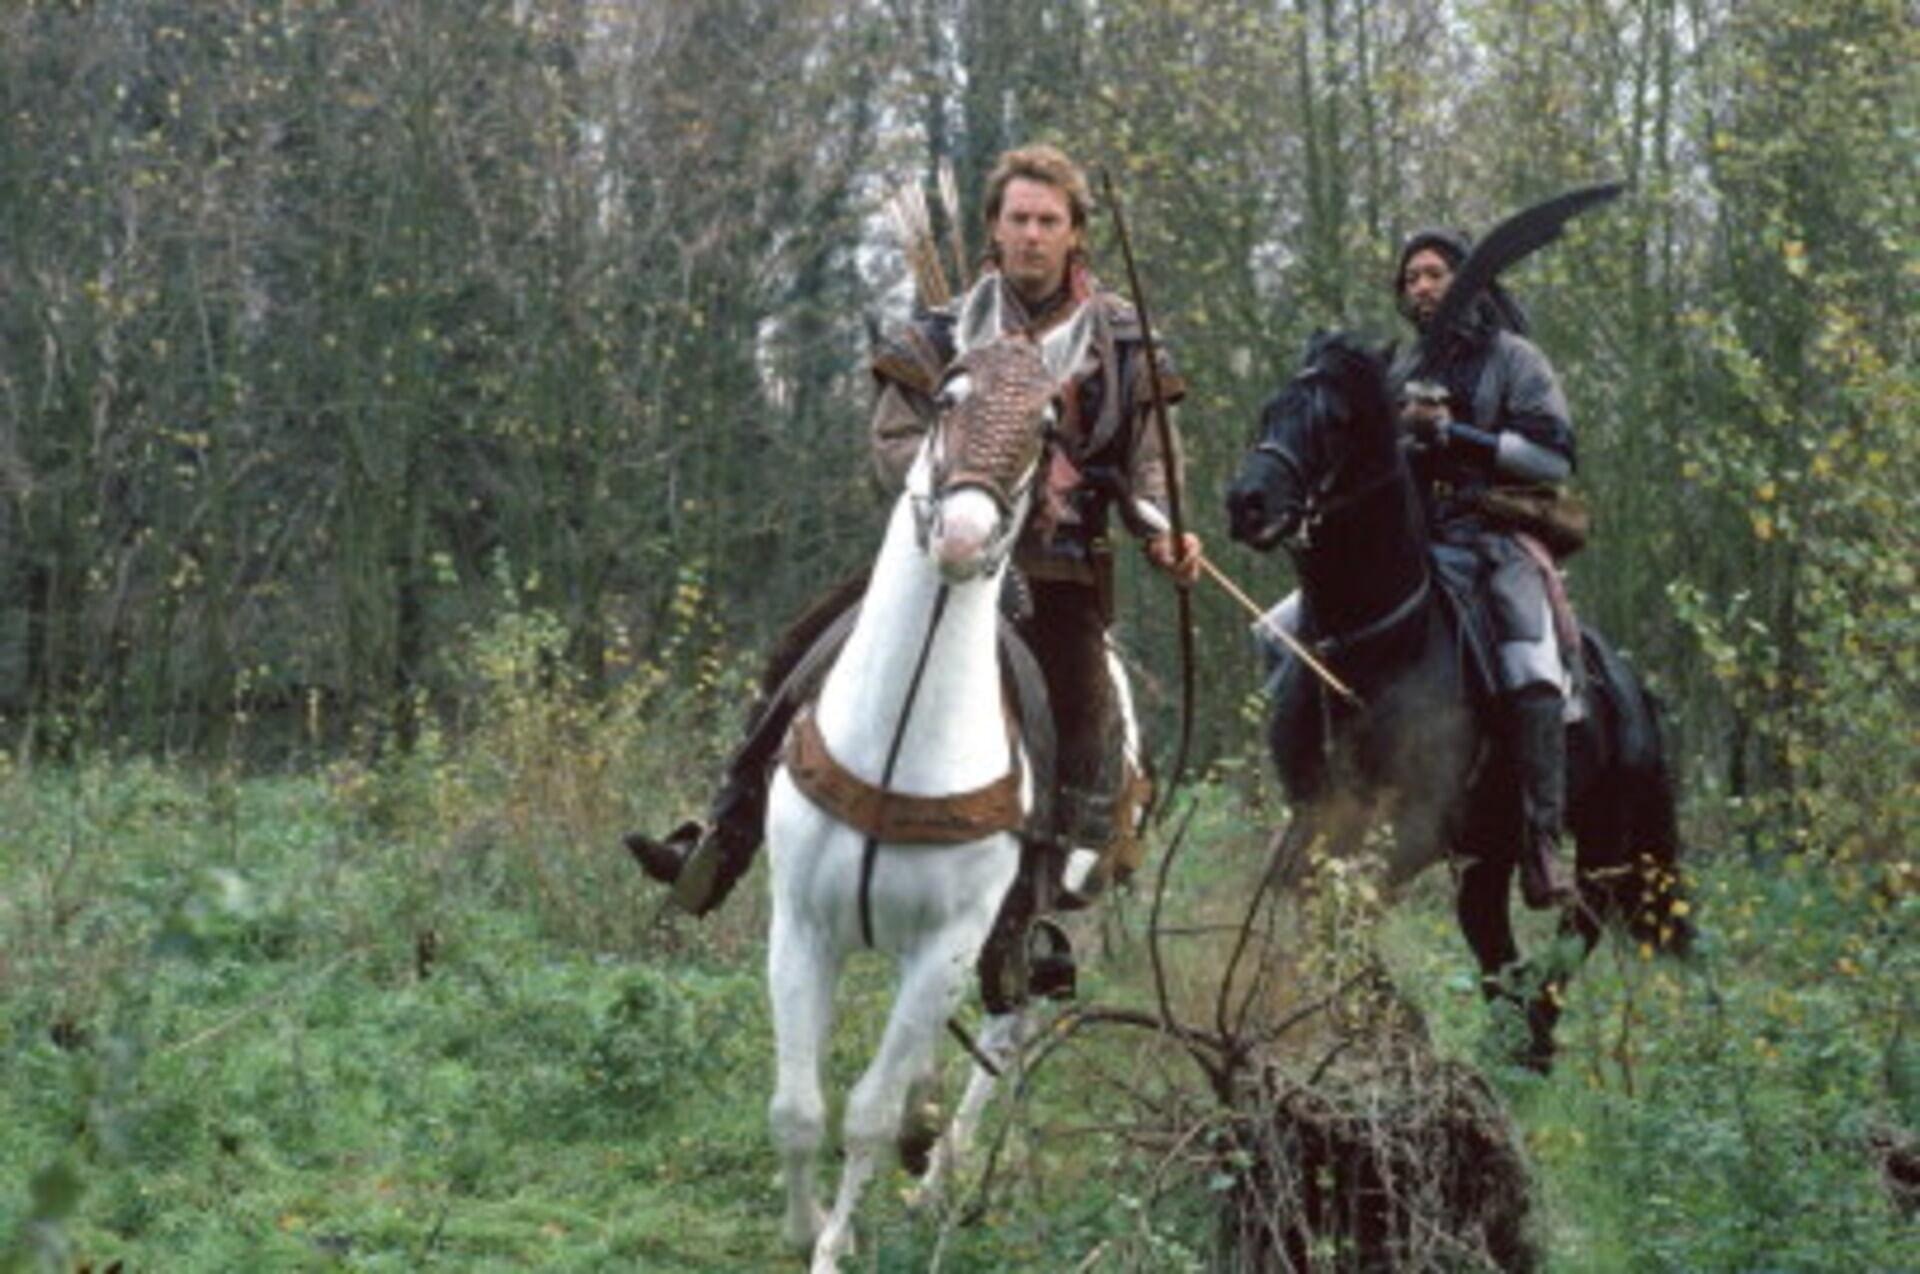 Robin Hood: Prince of Thieves - Image 6